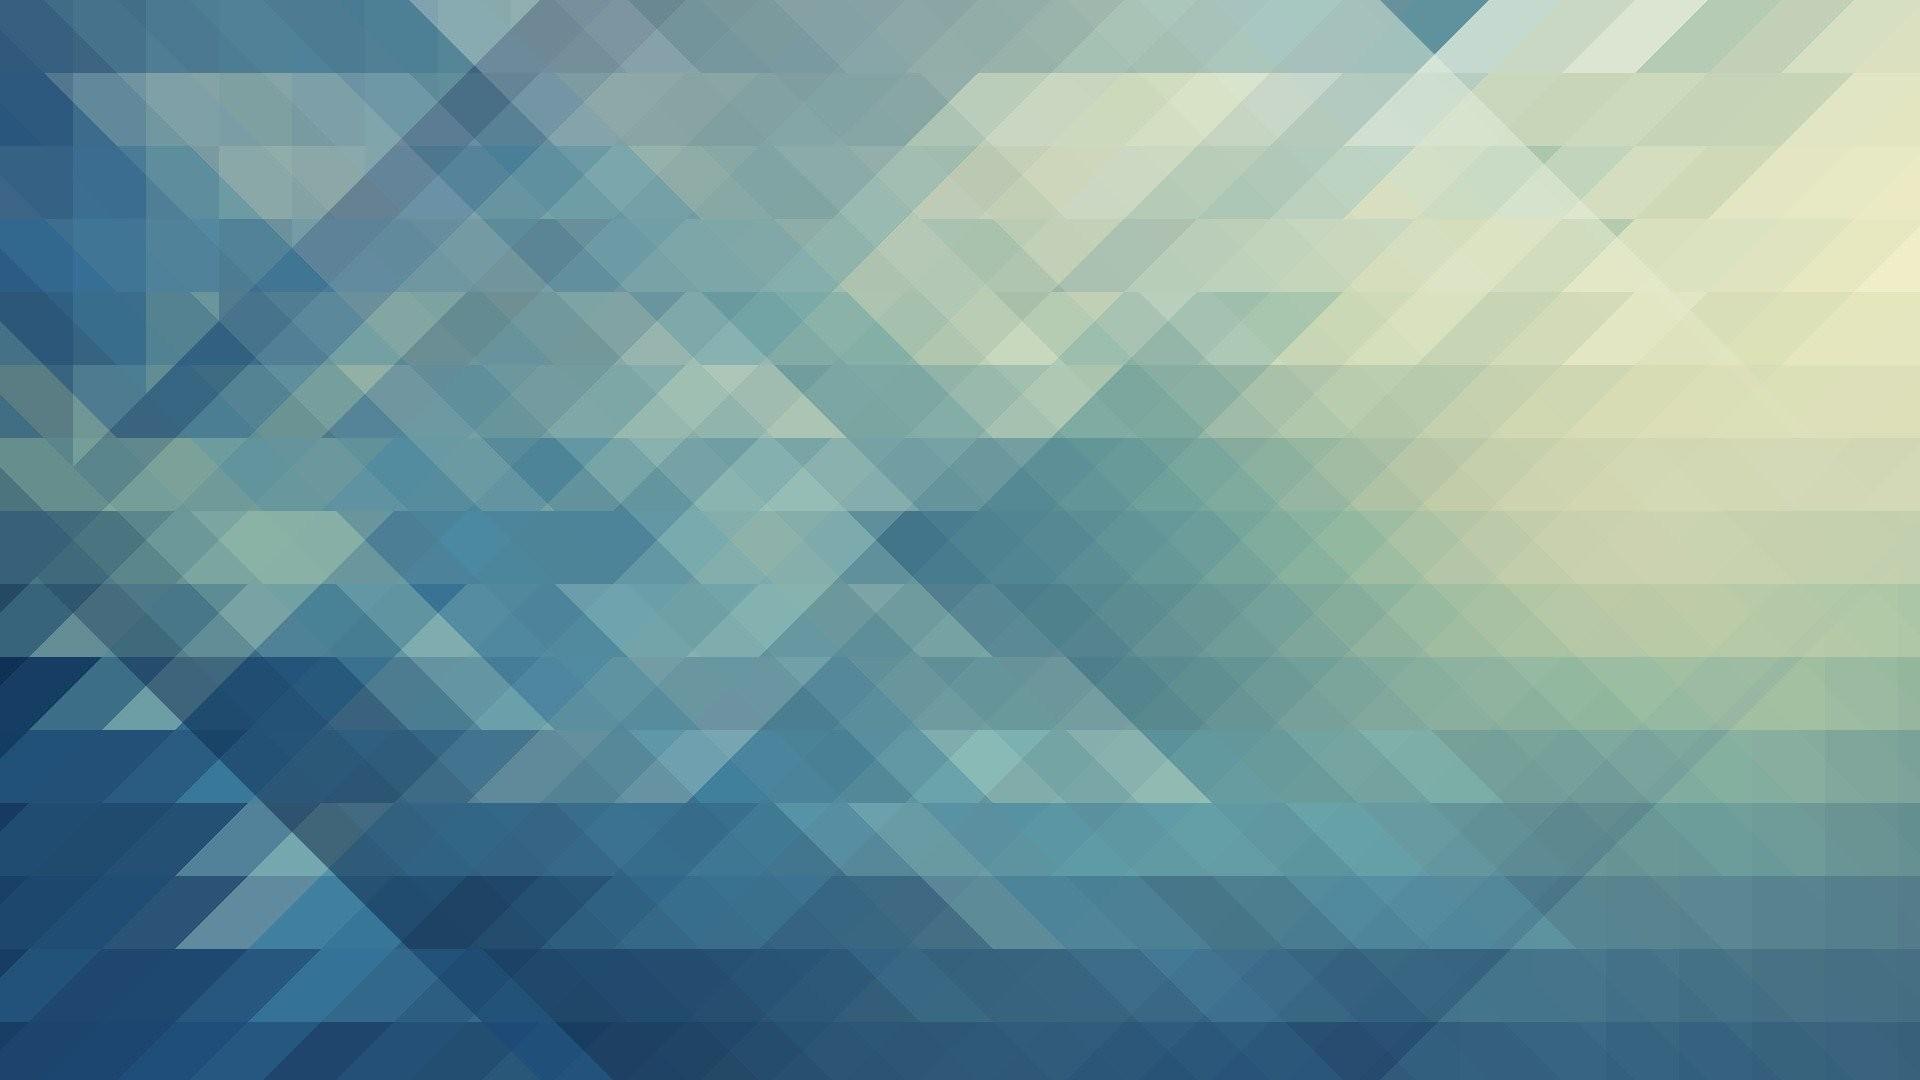 Geometric a wallpaper